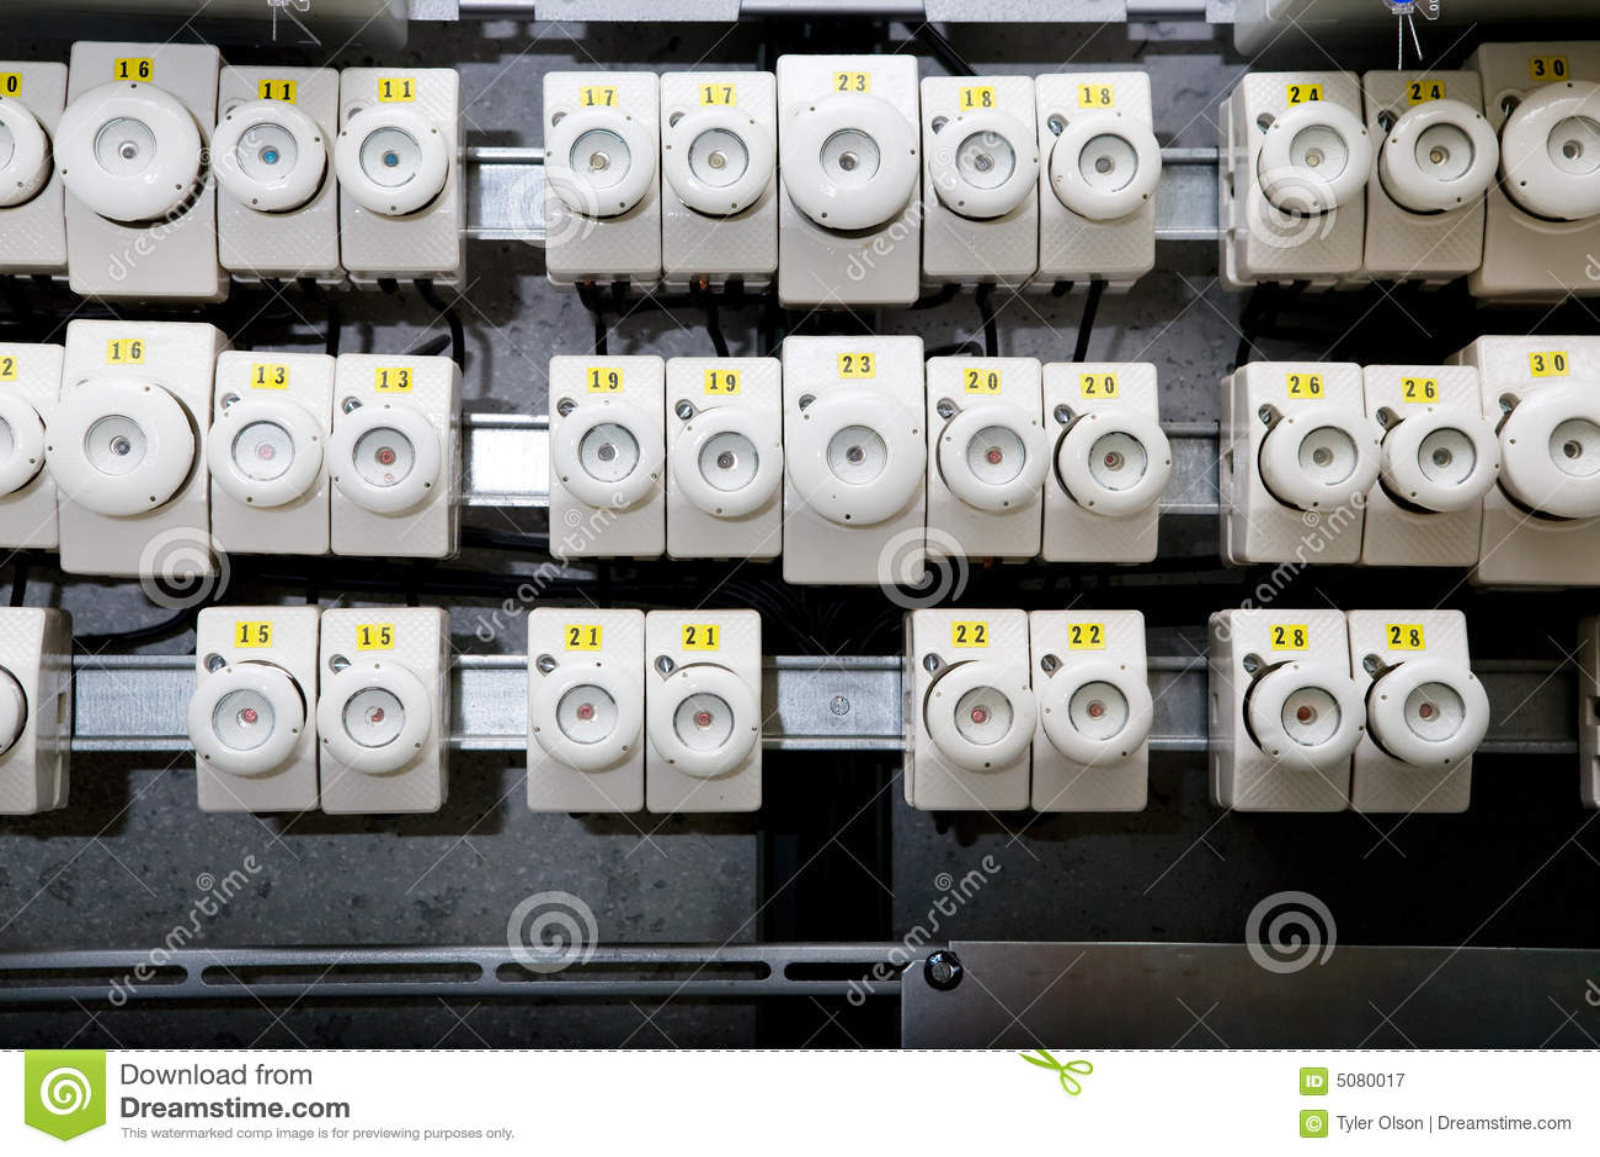 european breaker box stock image image of safety, rack 5080017european breaker box